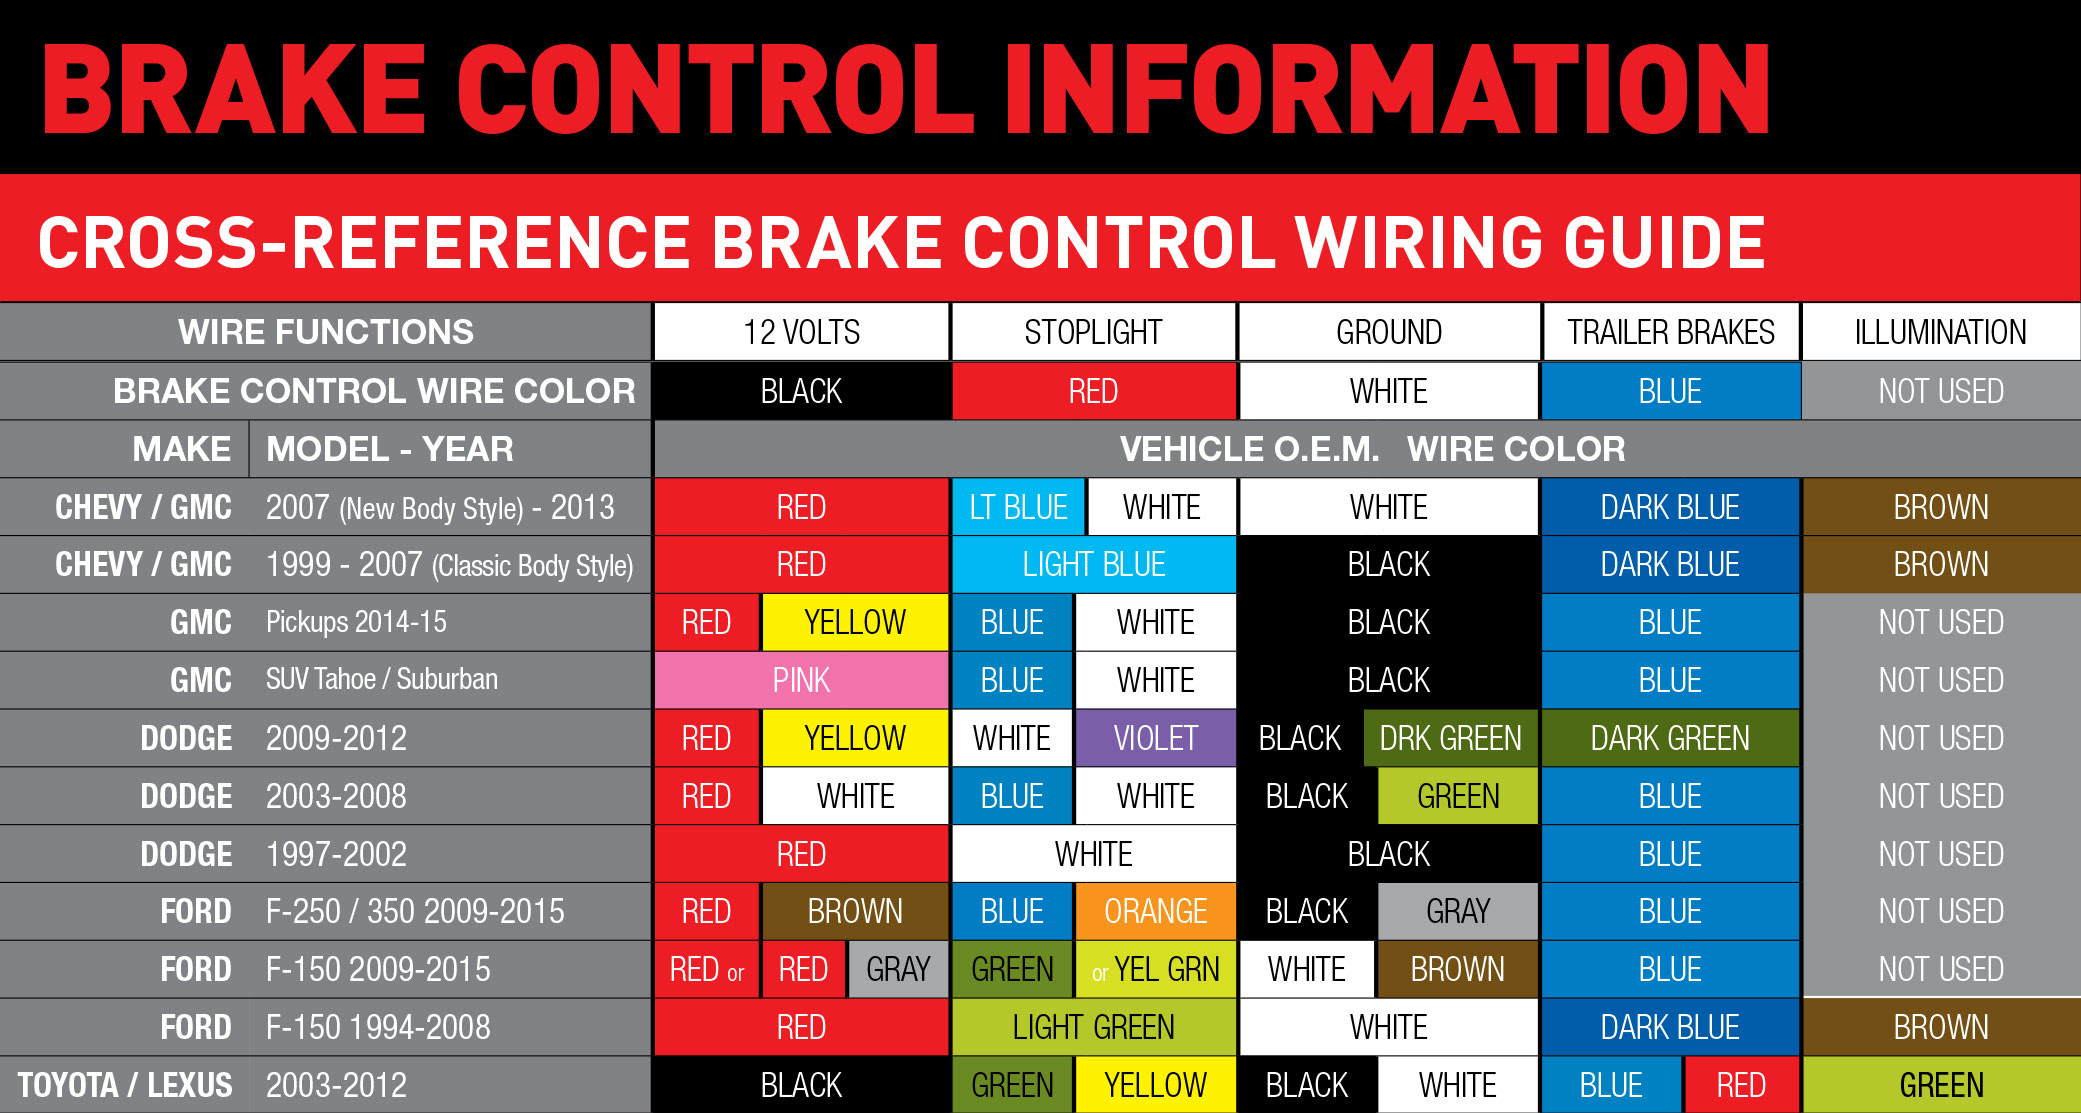 Ford Trailer Wiring Color Code Wiring Diagram Rich Network Rich Network Piuconzero It